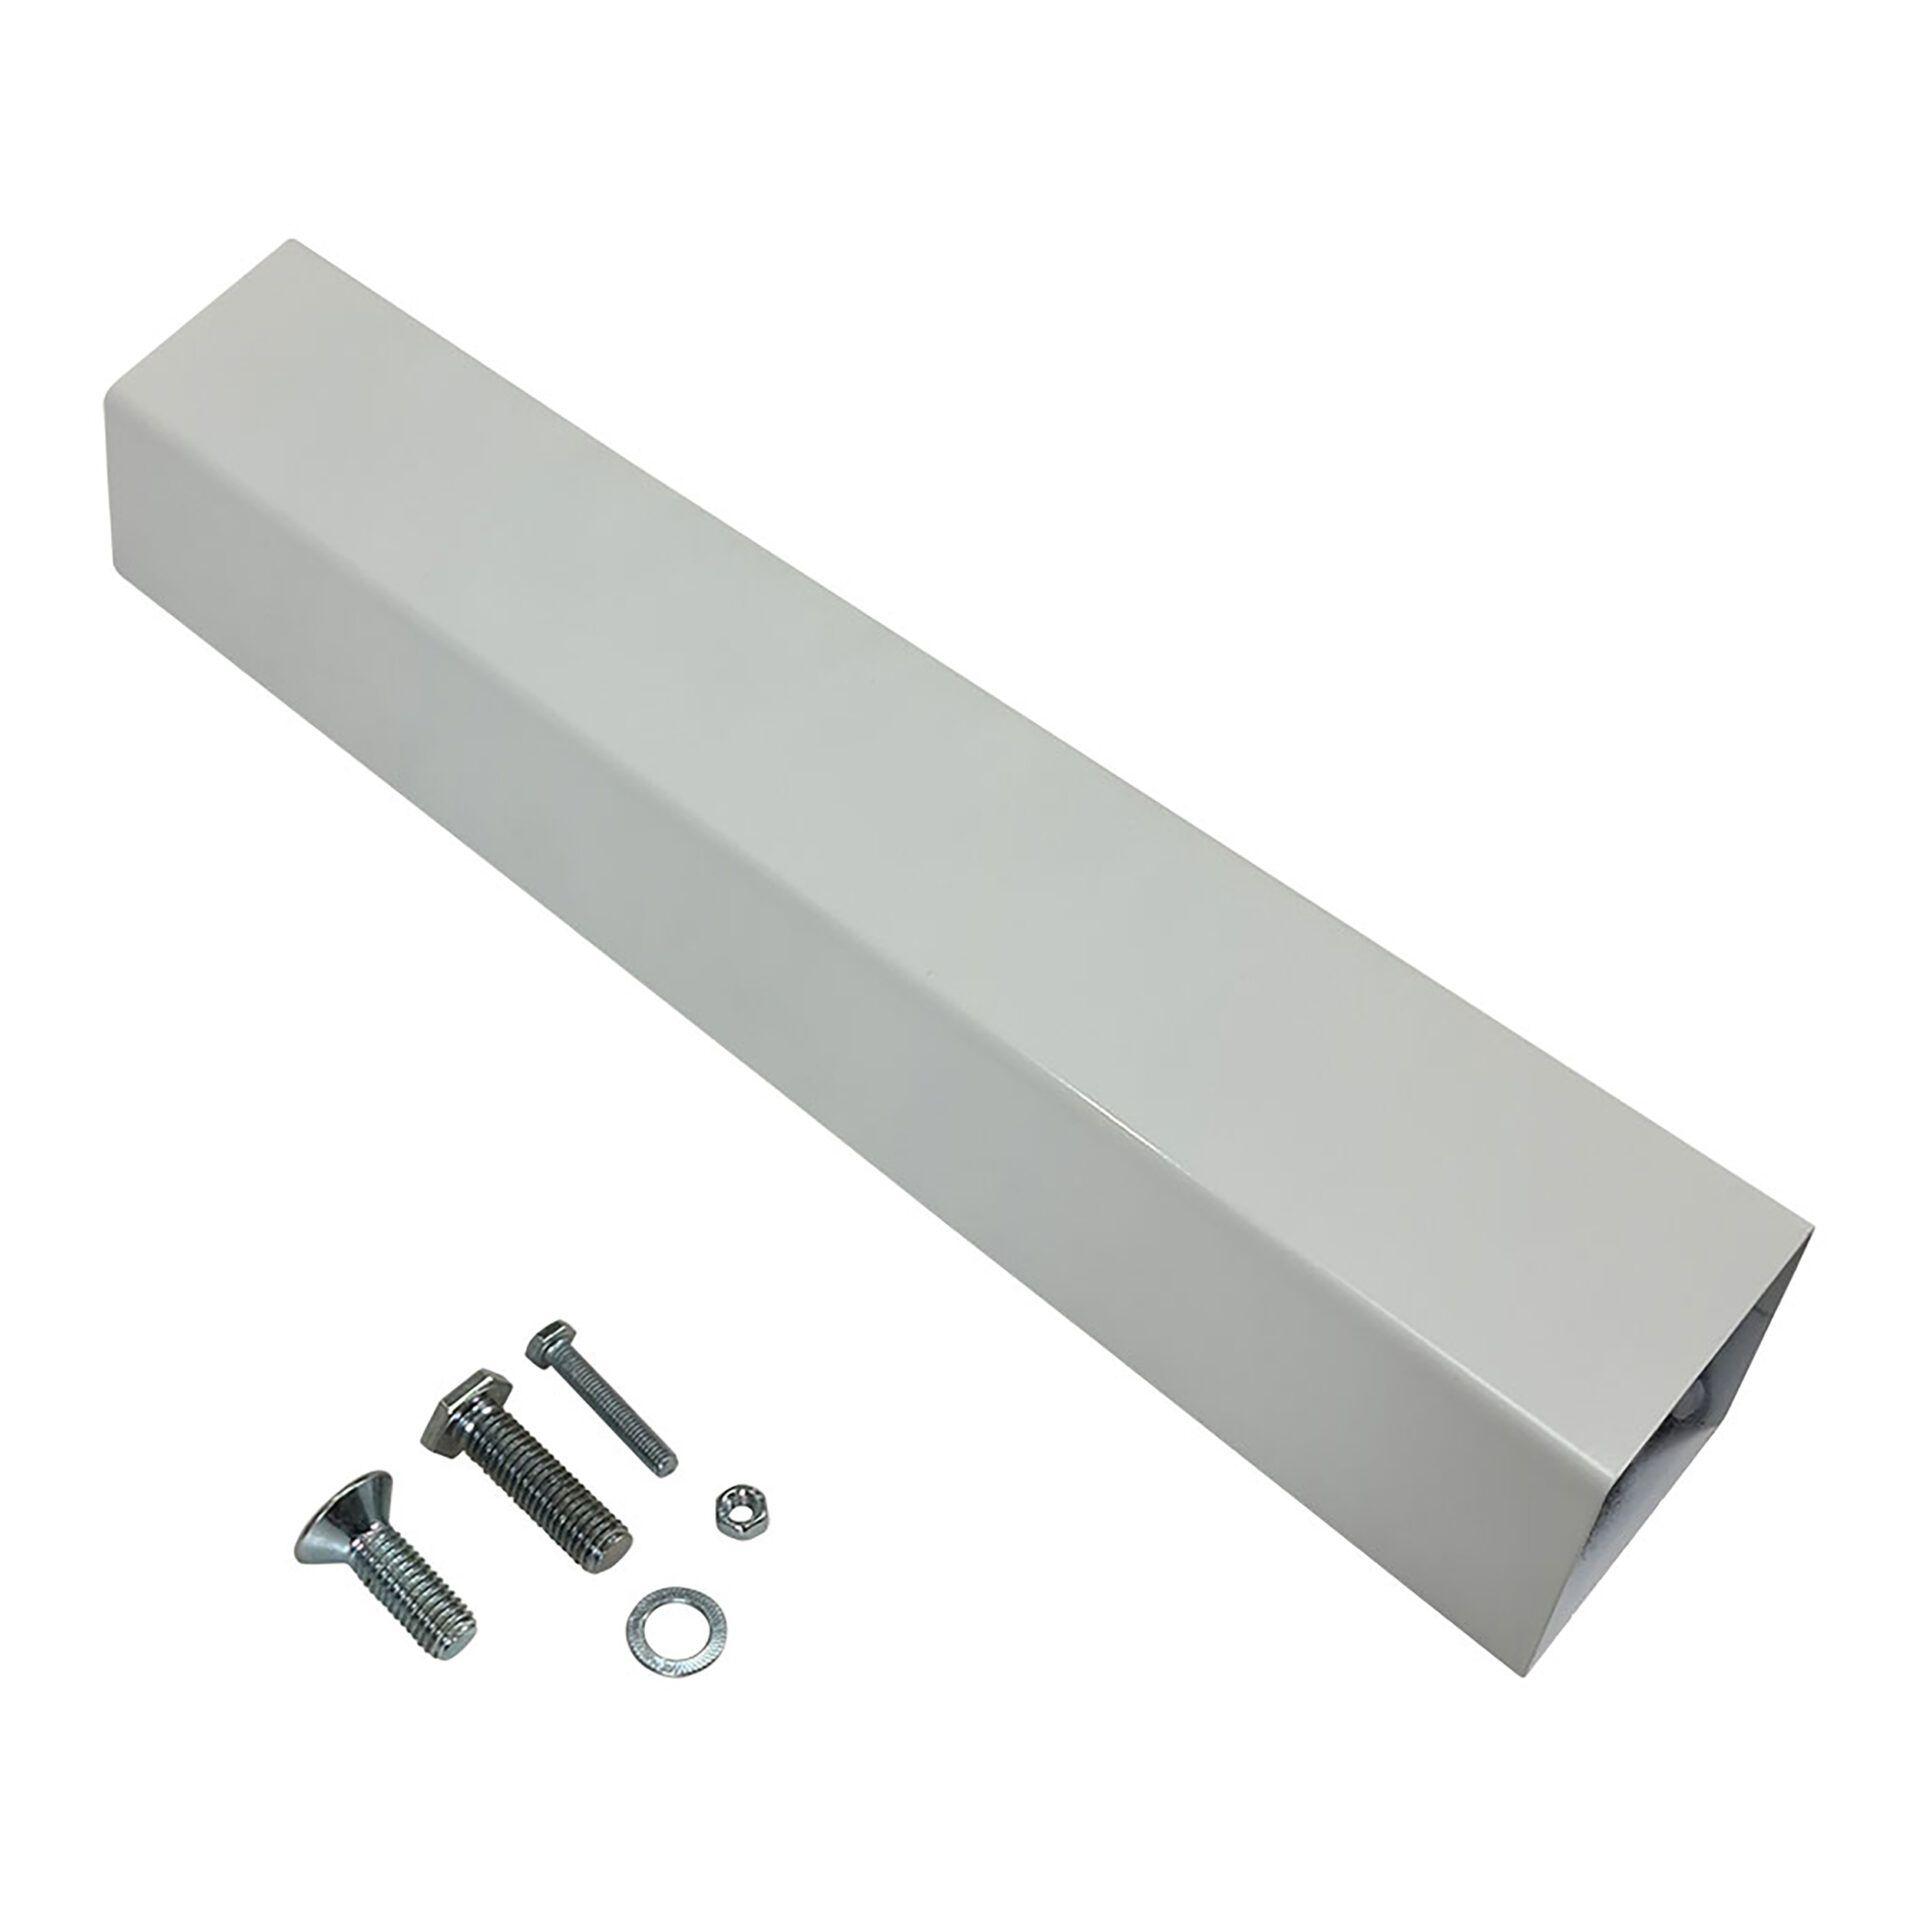 calais coffee table base white.pole .pole .parts